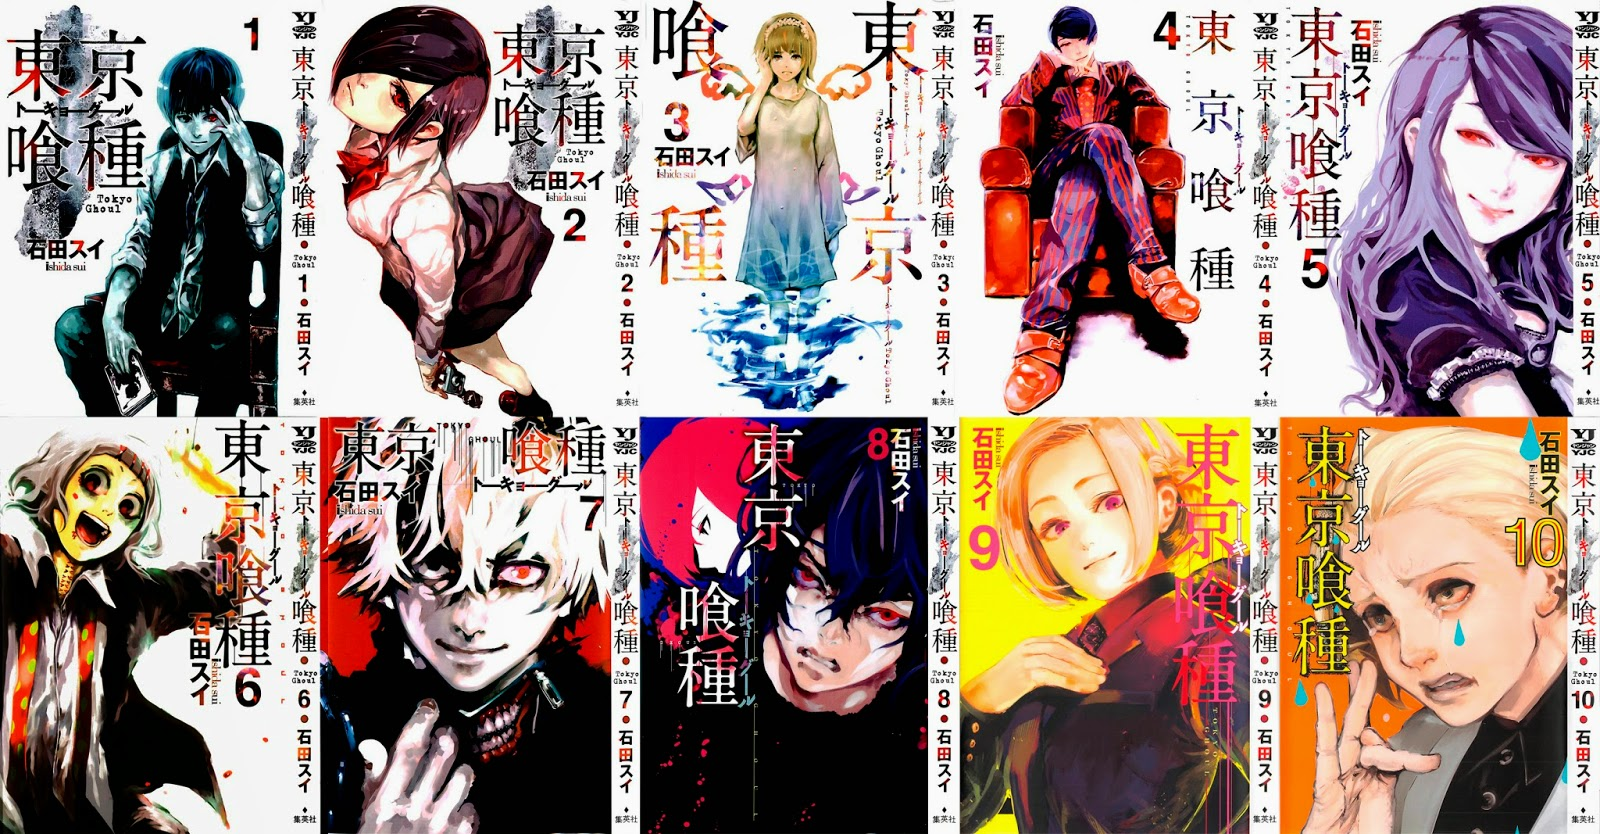 Tokyo Ghoul (Manga) portadas